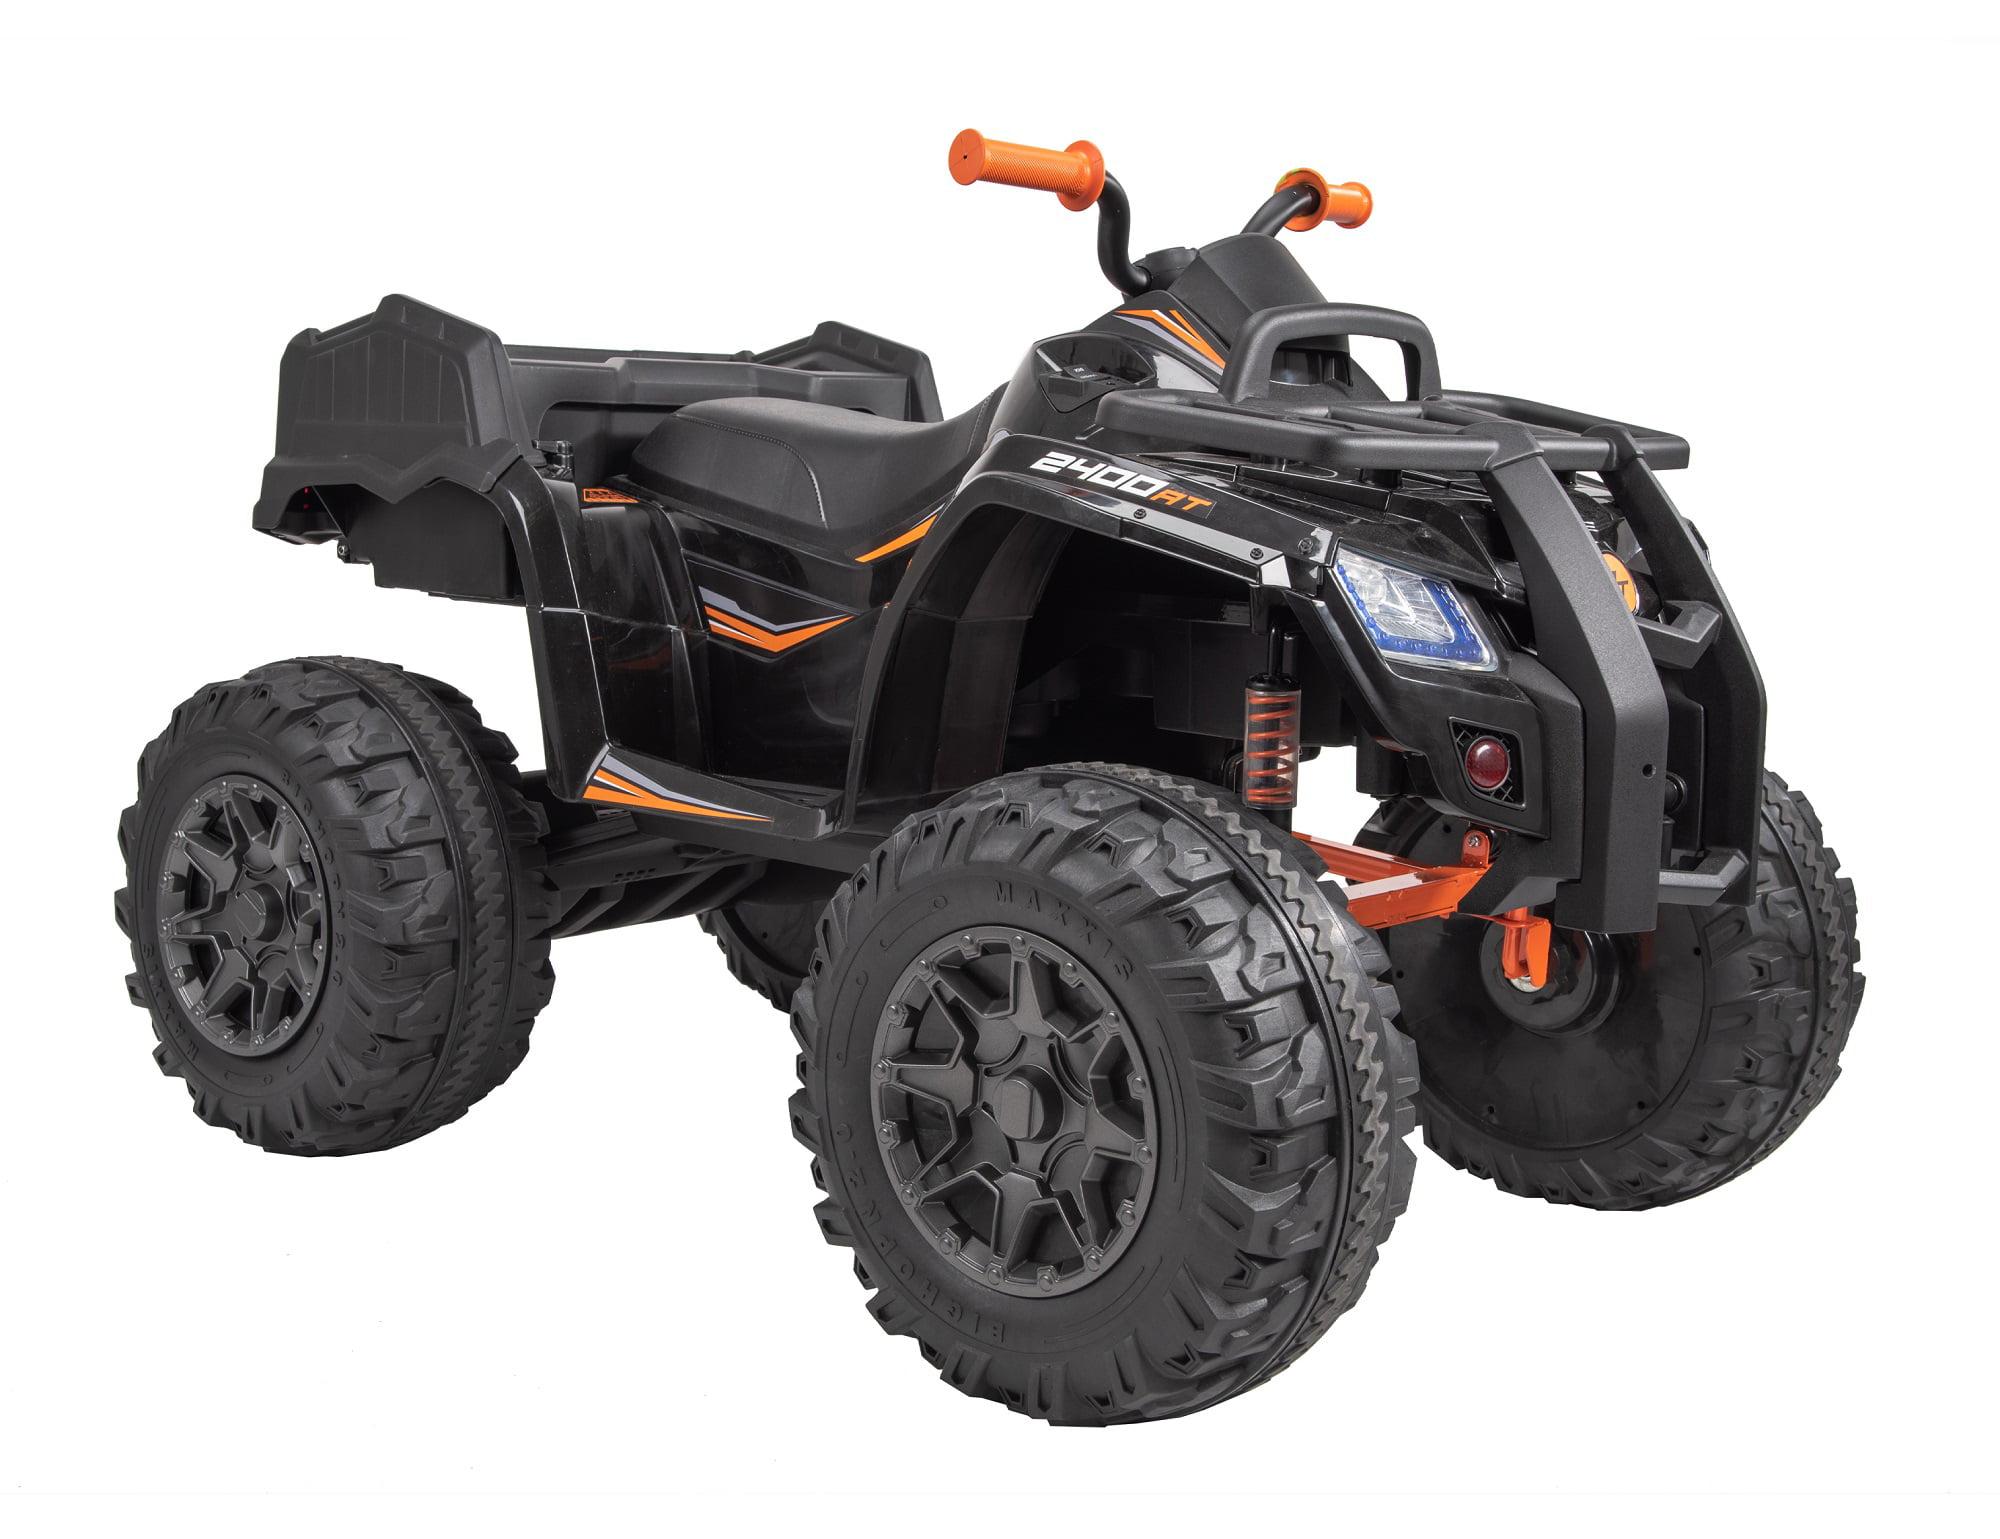 Huffy Torex ATV Kids' 24V 4-Wheeler Electric Ride-On by Huffy